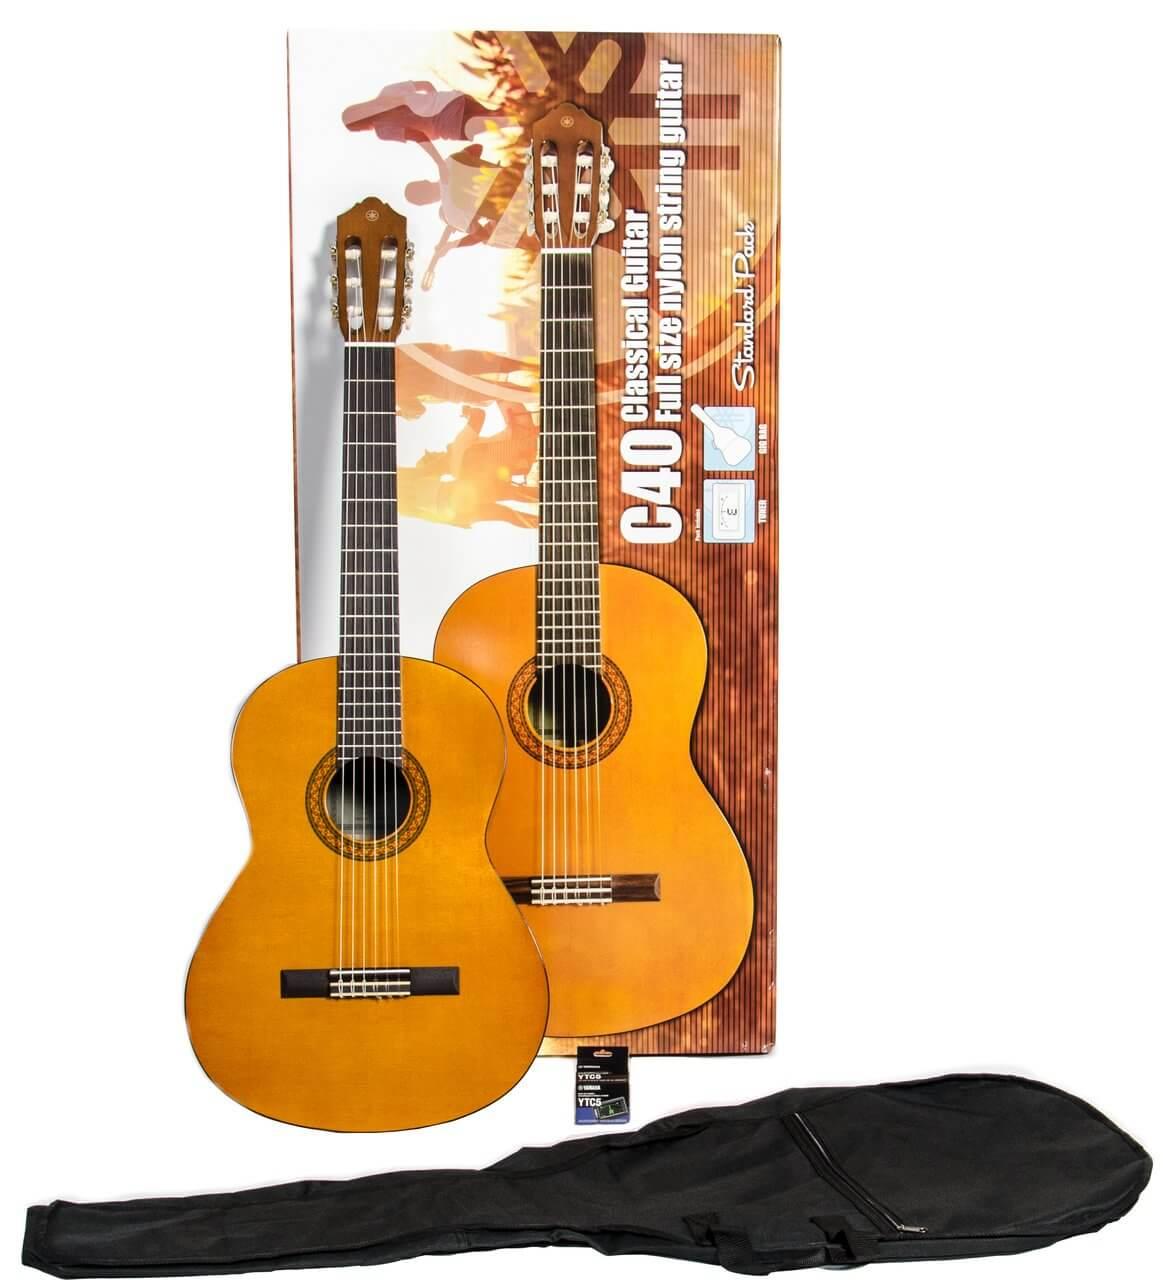 Pack Guitarra Clasica Yamaha C-40 +Funda+Afin